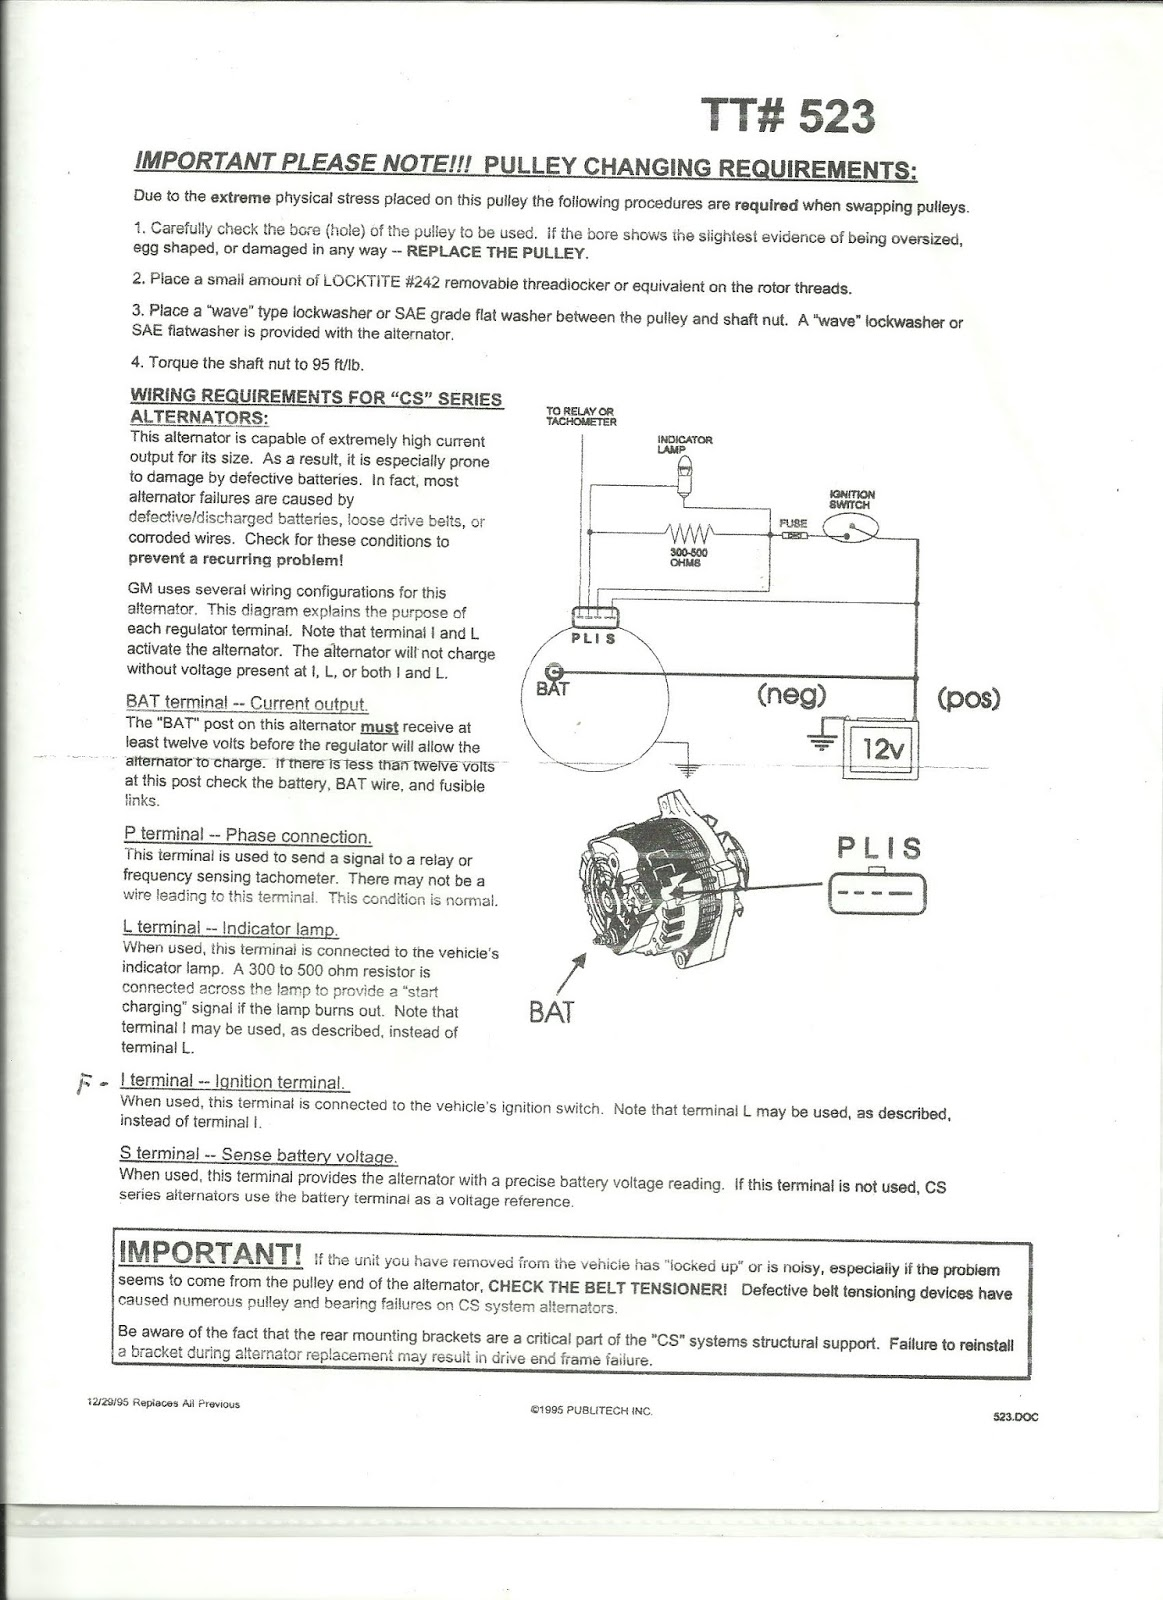 gm cs series alternator wiring [ 1163 x 1600 Pixel ]